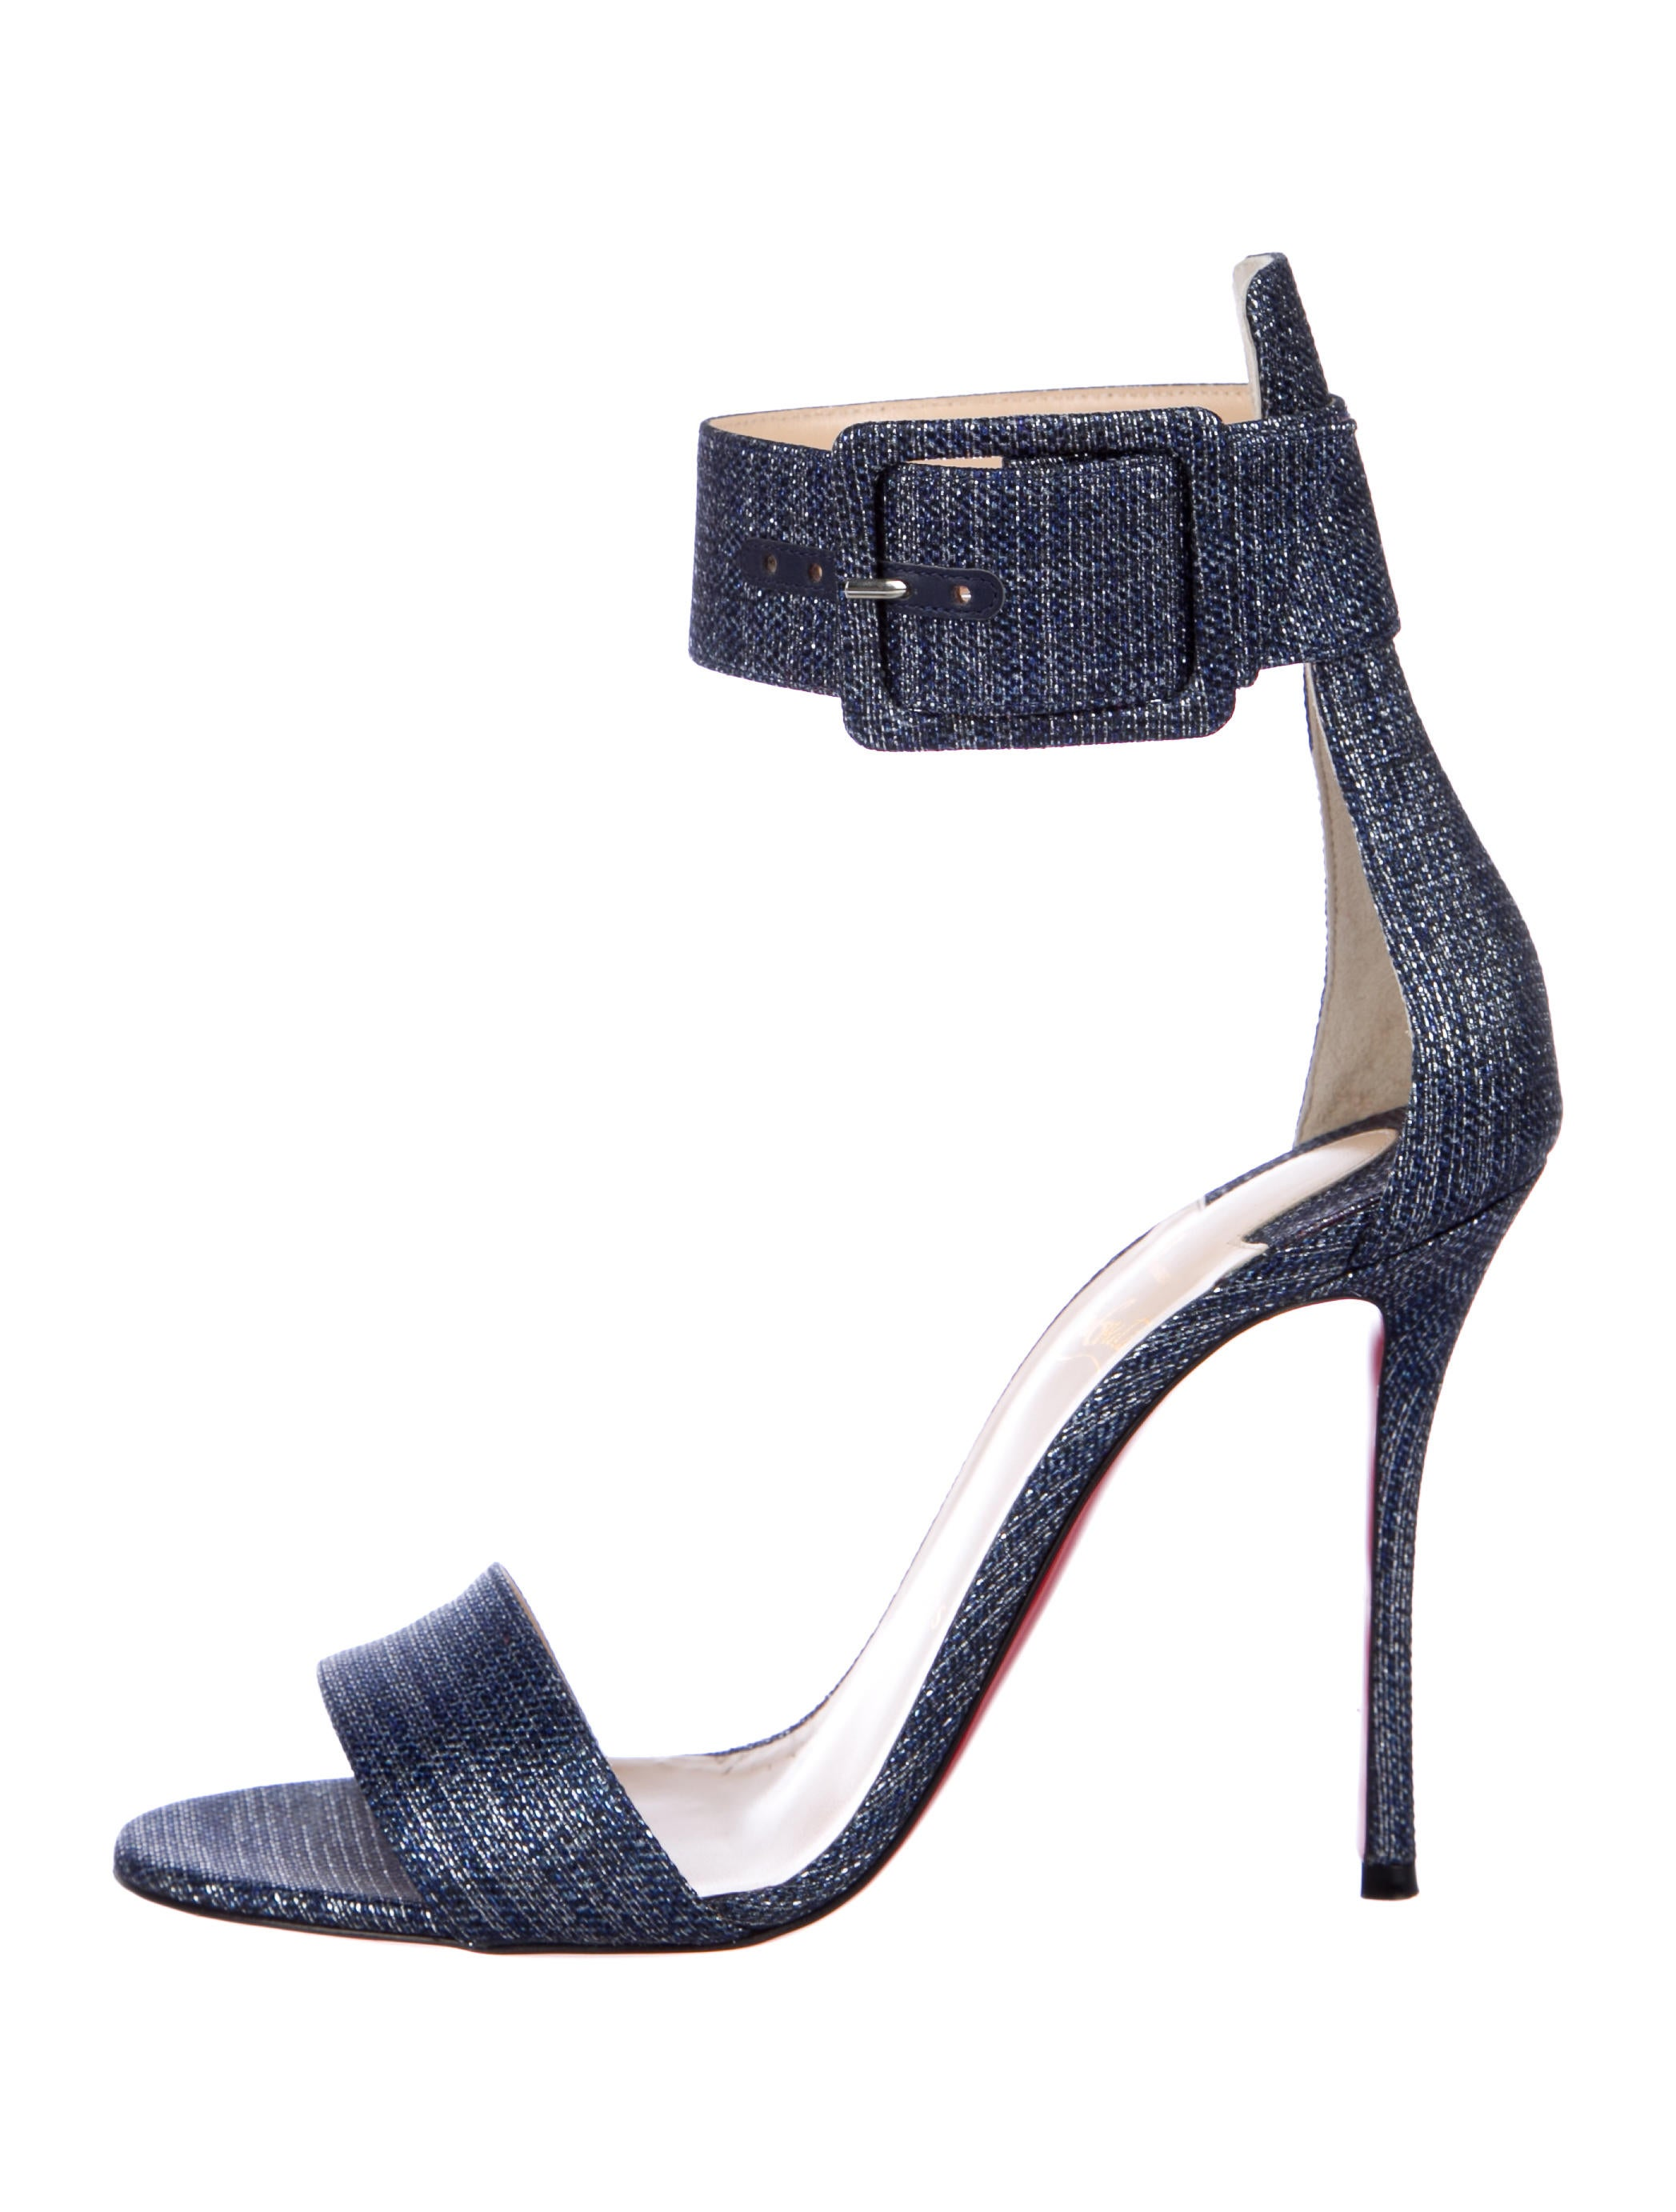 439c80c2ae89 Christian Louboutin Blade Runana Sandals - Shoes - CHT109211